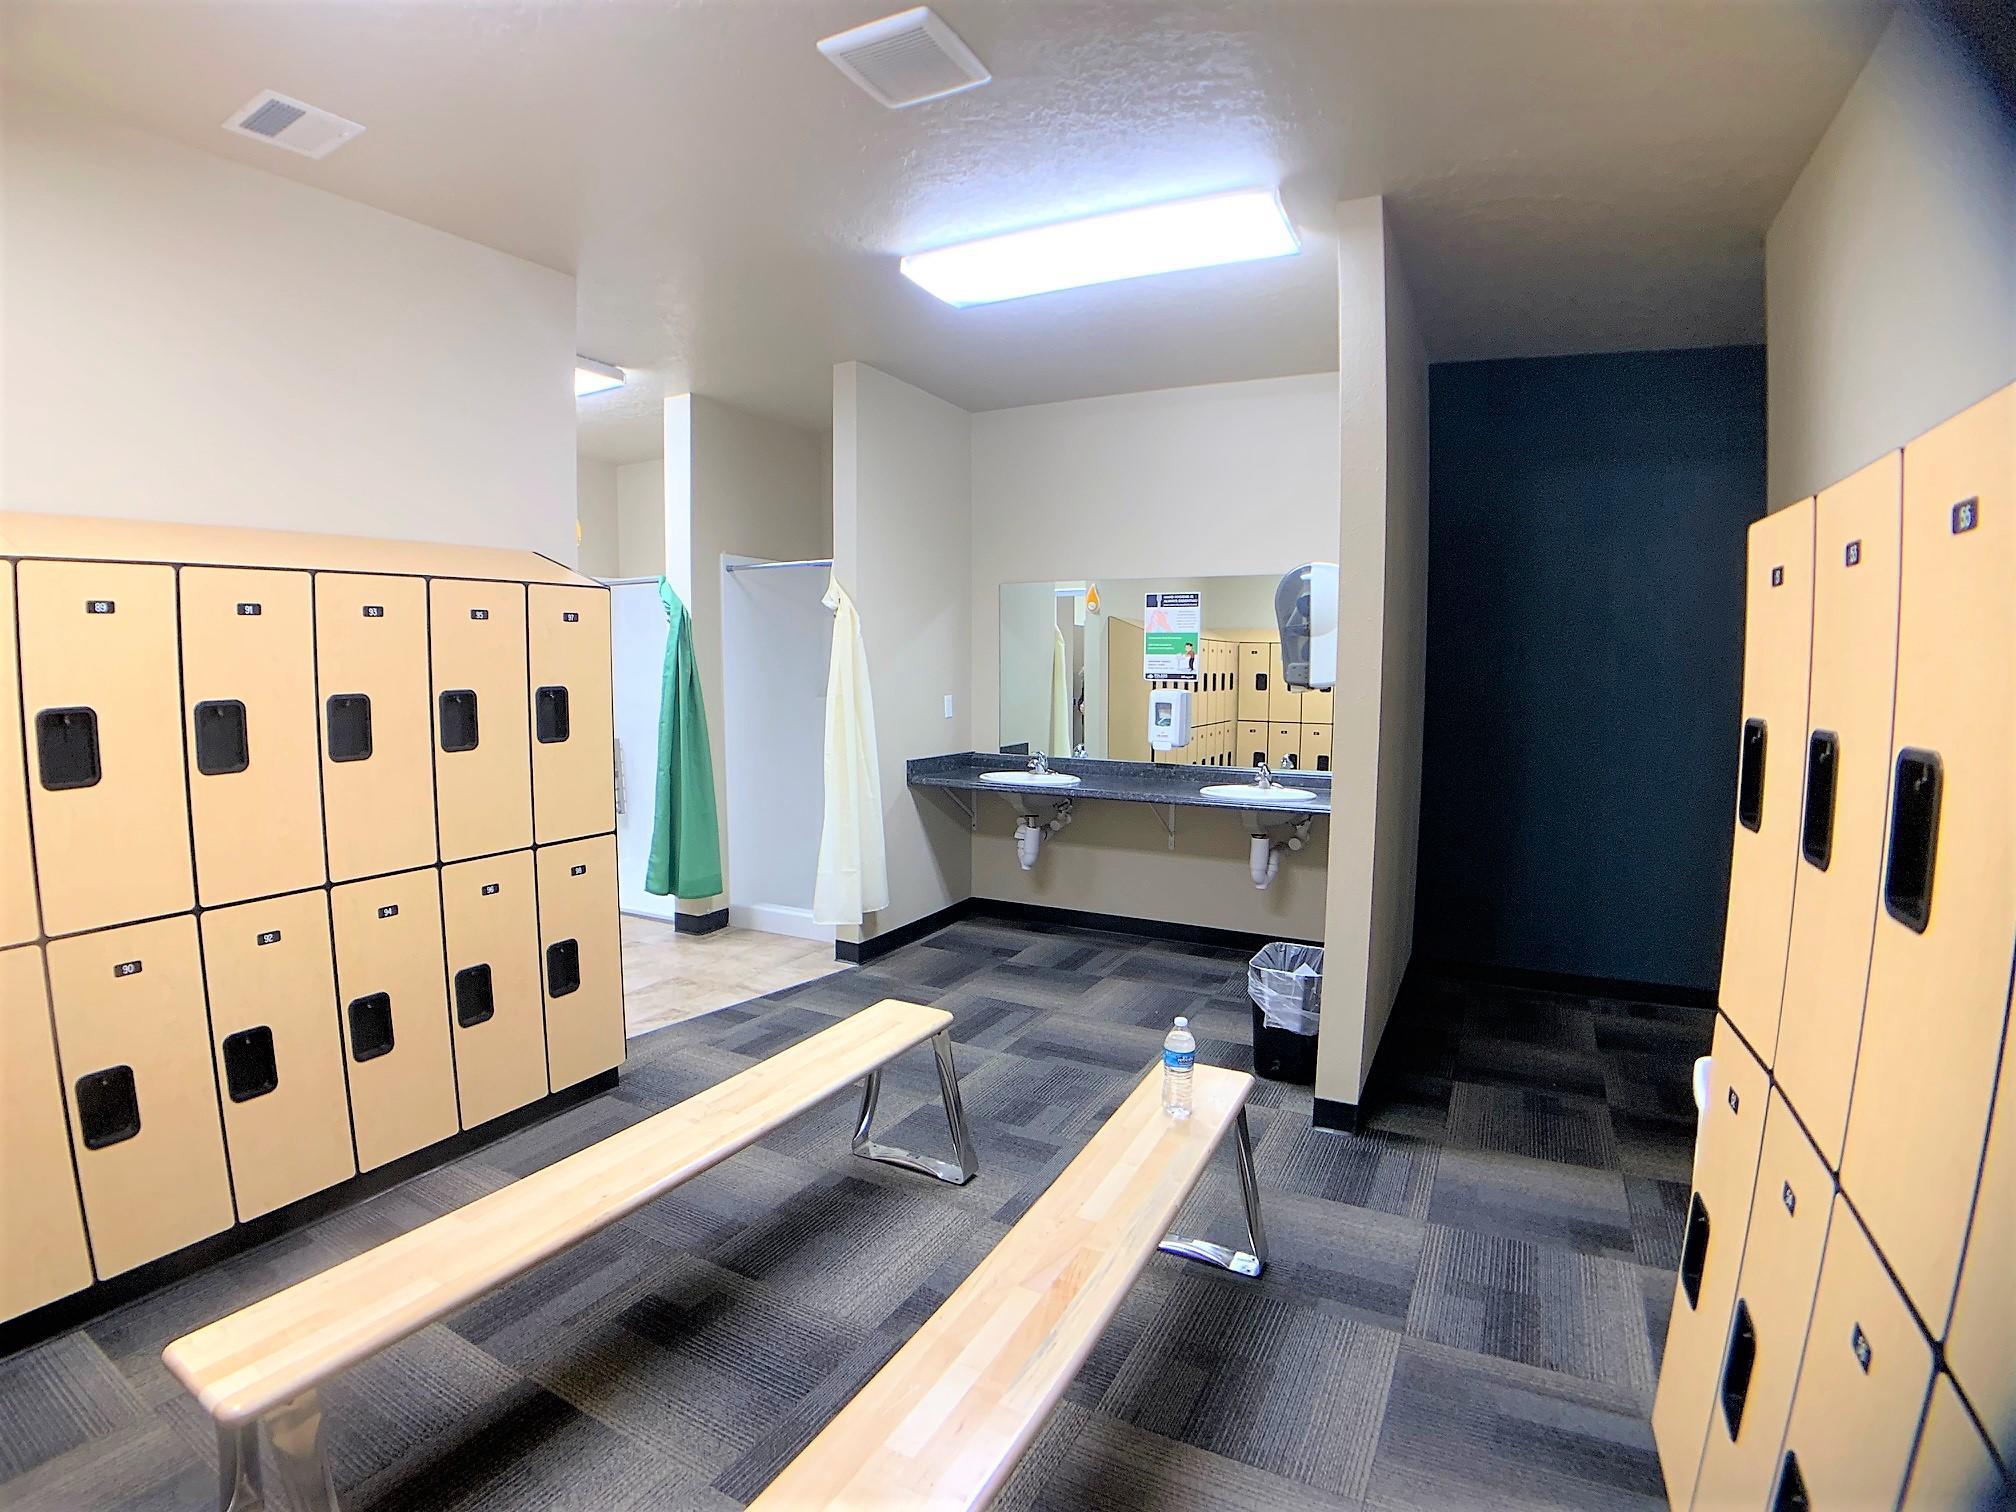 locker room with sinks